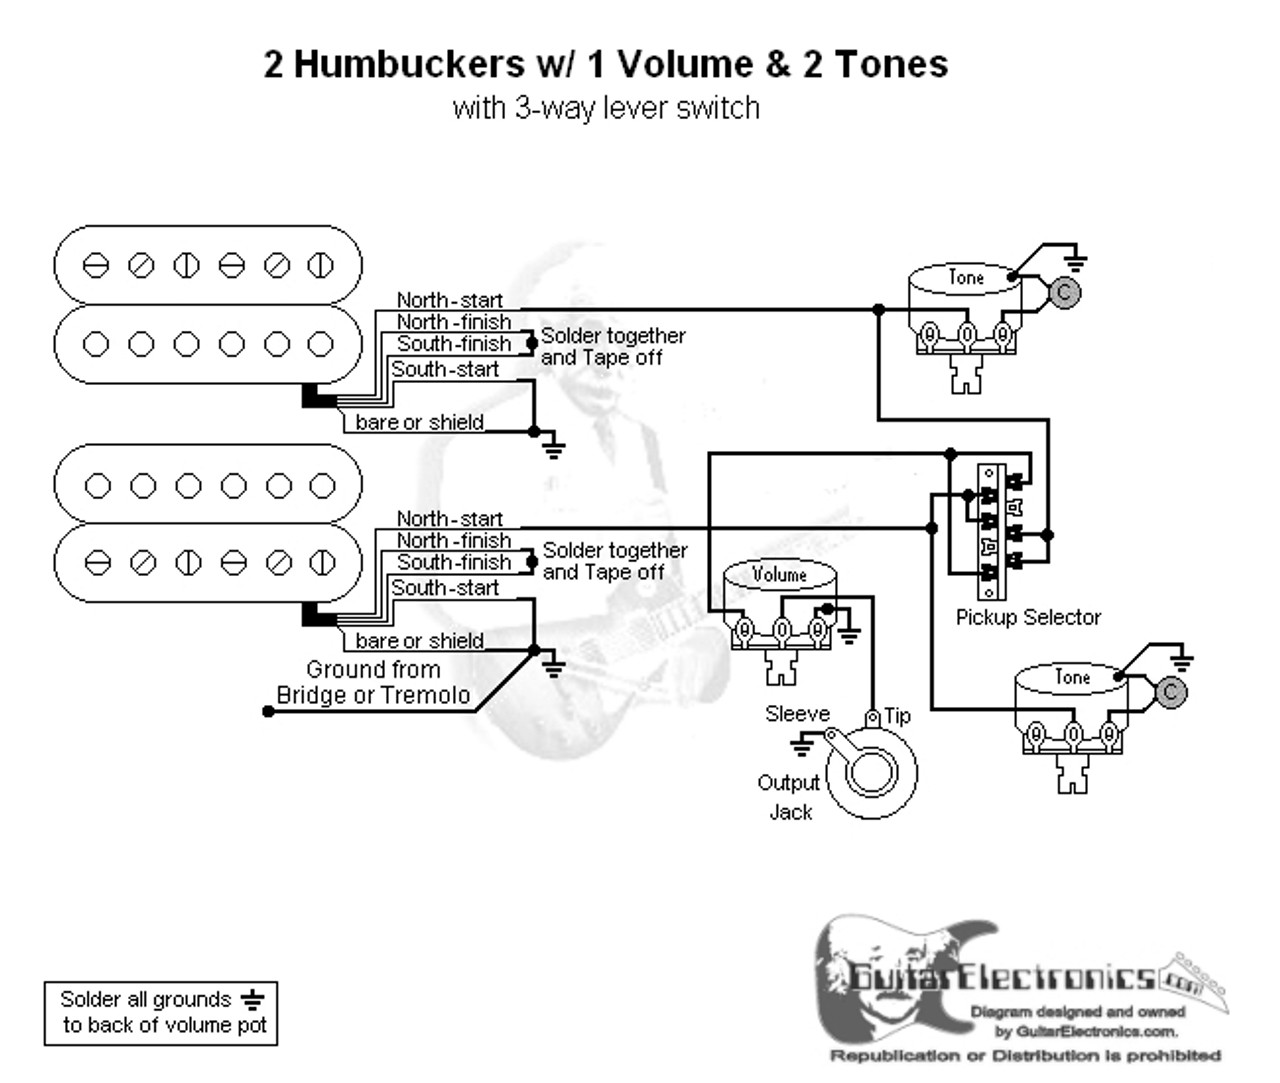 medium resolution of strat wiring diagram 1 volume 2 tones auto wiring diagram2 humbuckers 3 way lever switch 1 volume 2 tones hss strat wiring diagram 1 volume 2 tone strat